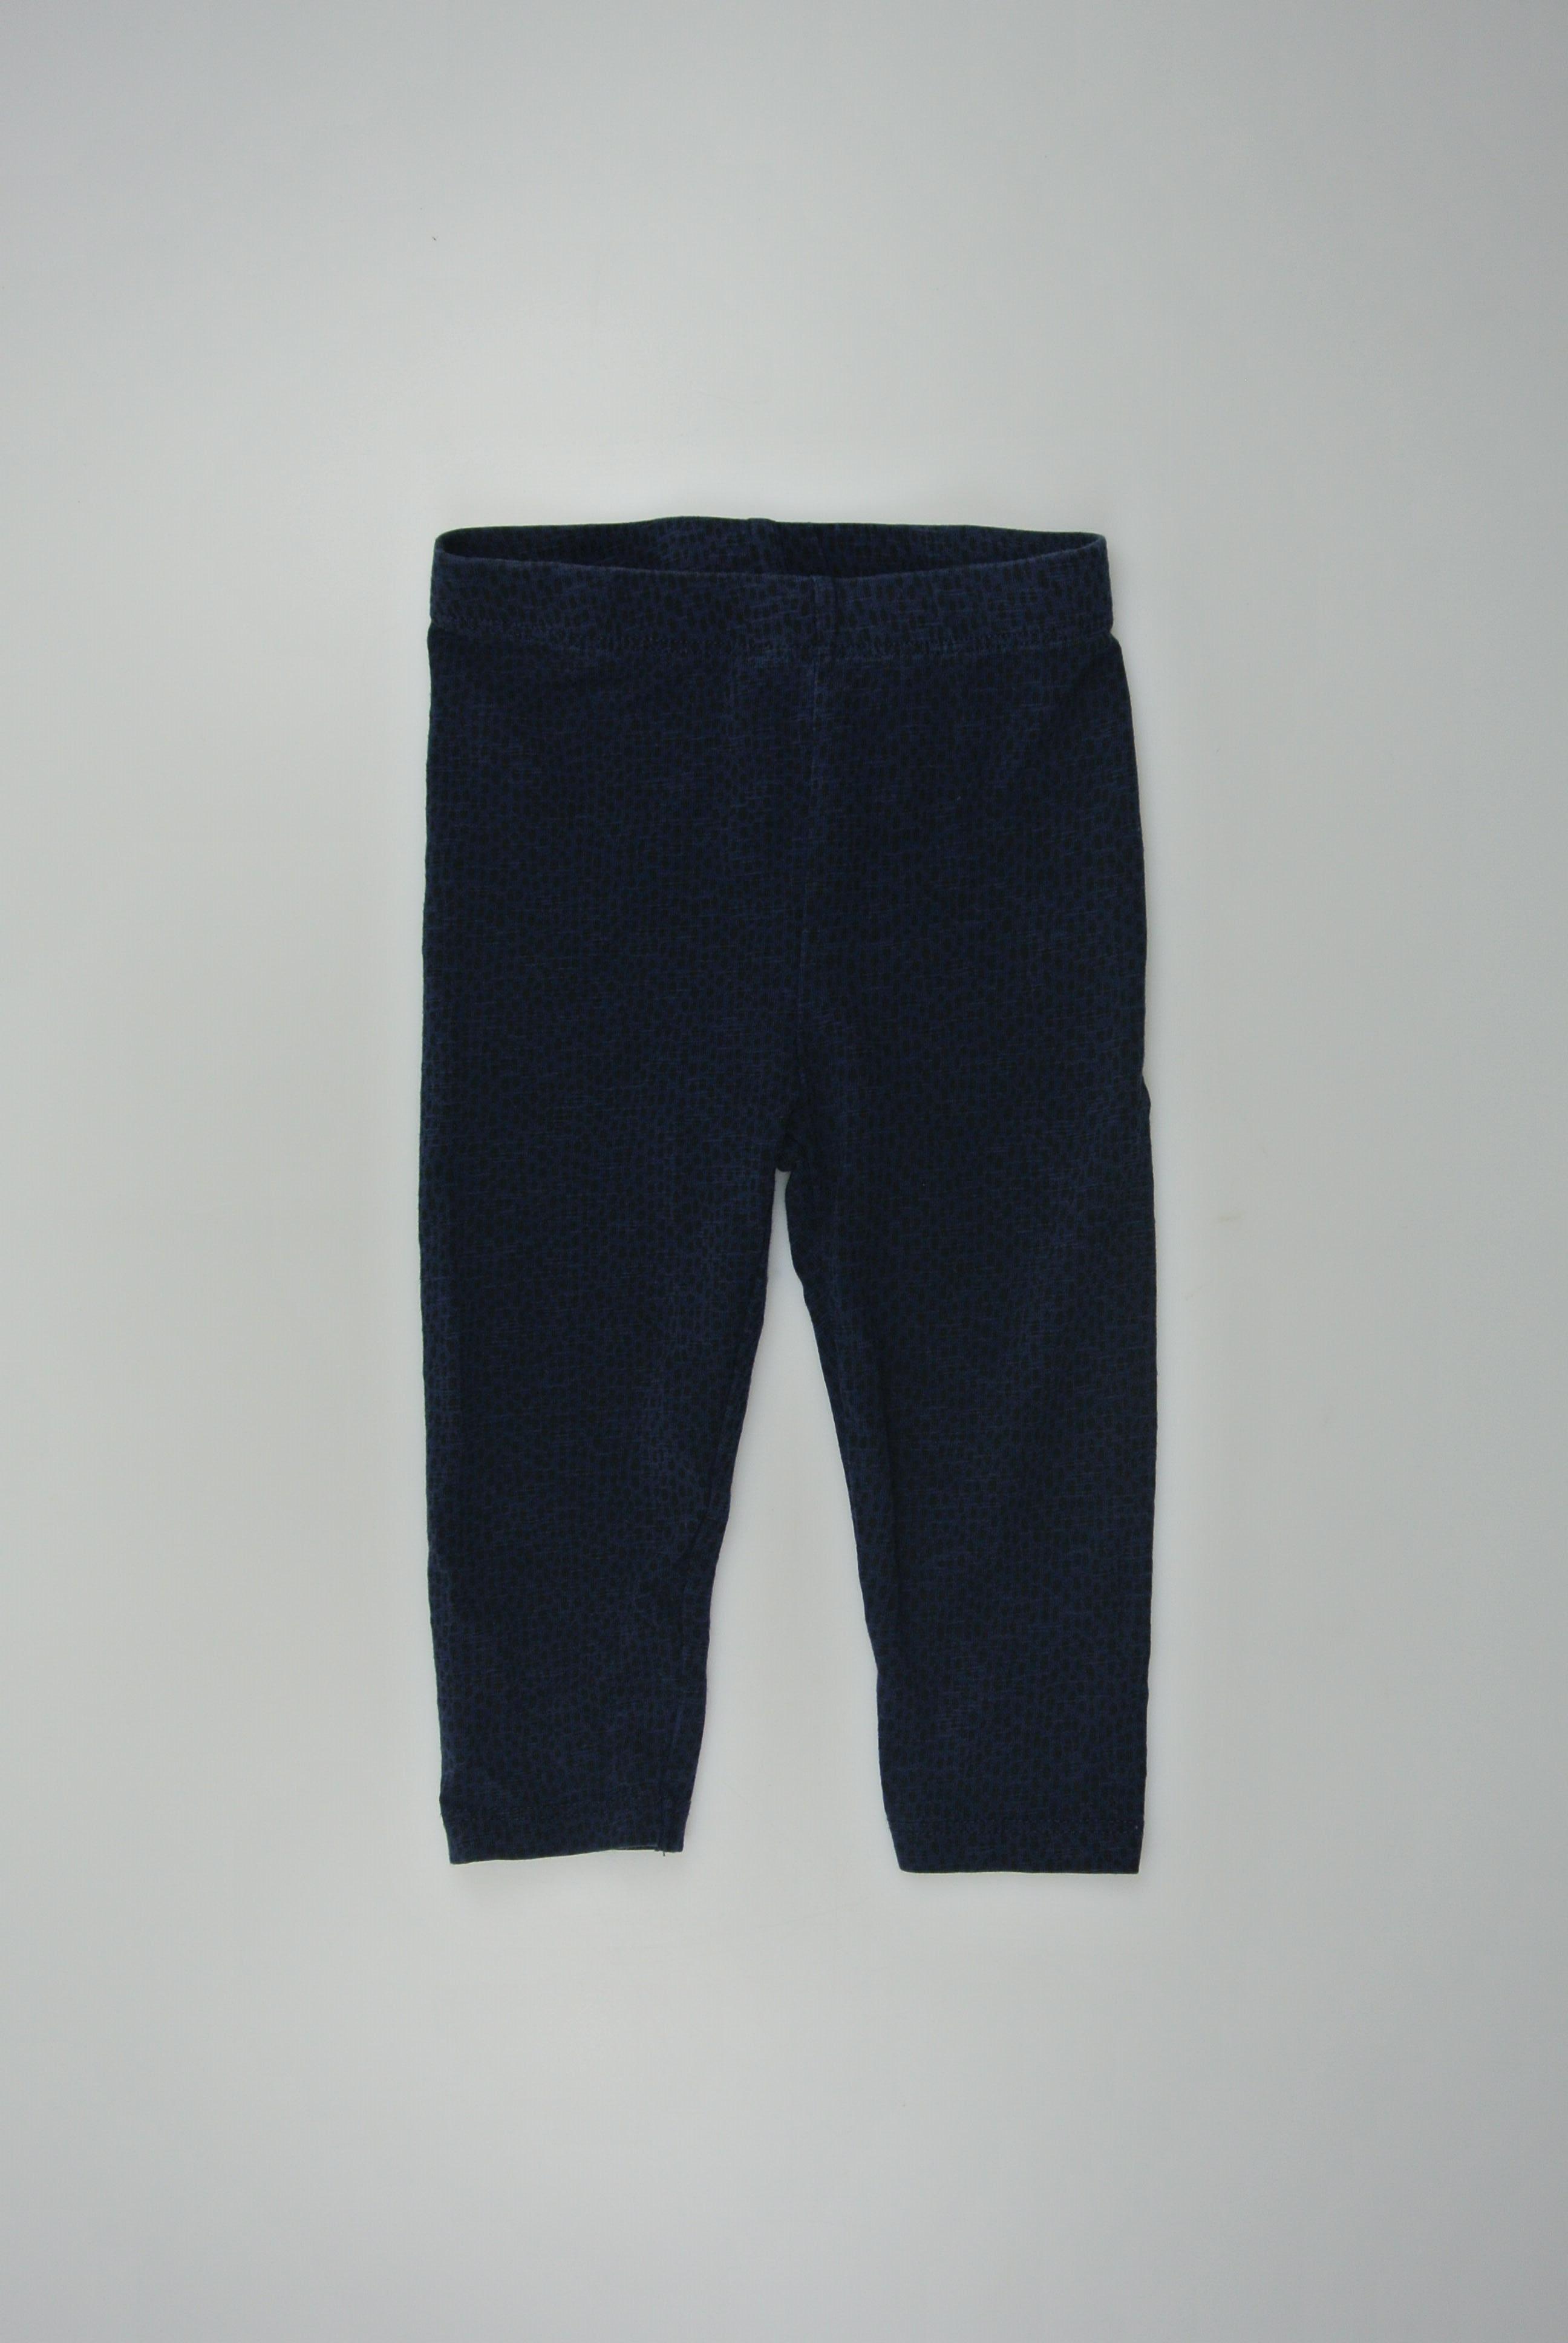 Soft gallery bukser str 62 dreng